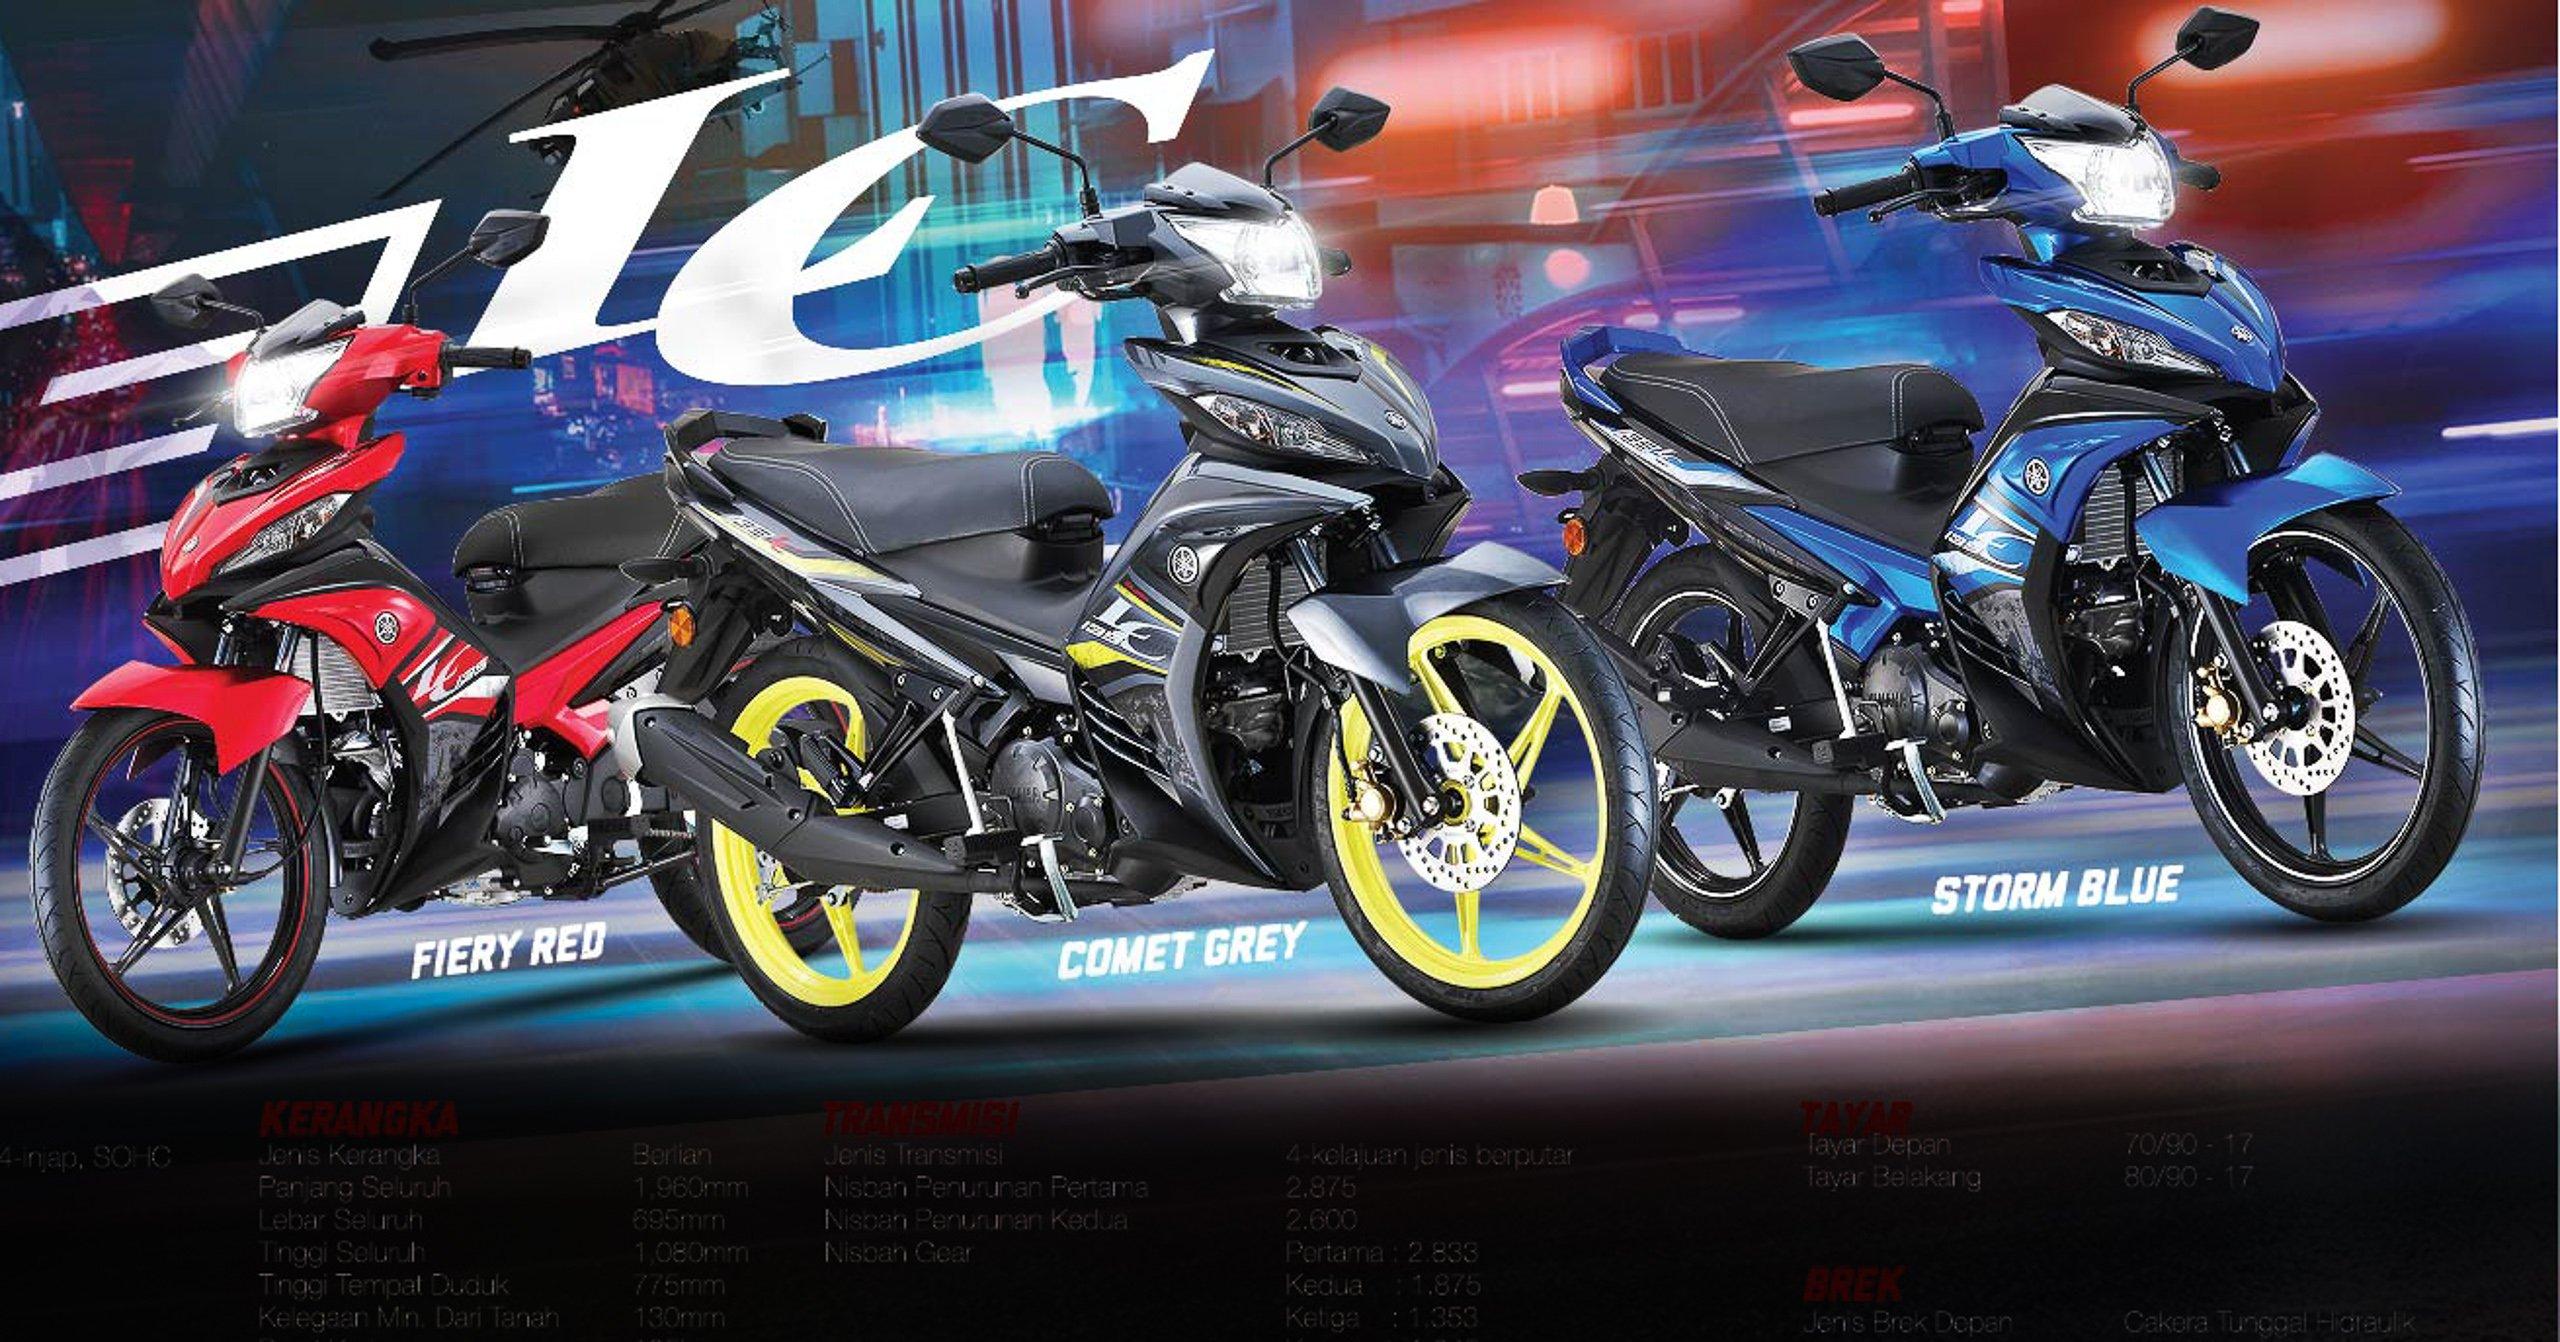 2019 Yamaha 135LC on sale in Malaysia, RM6,868